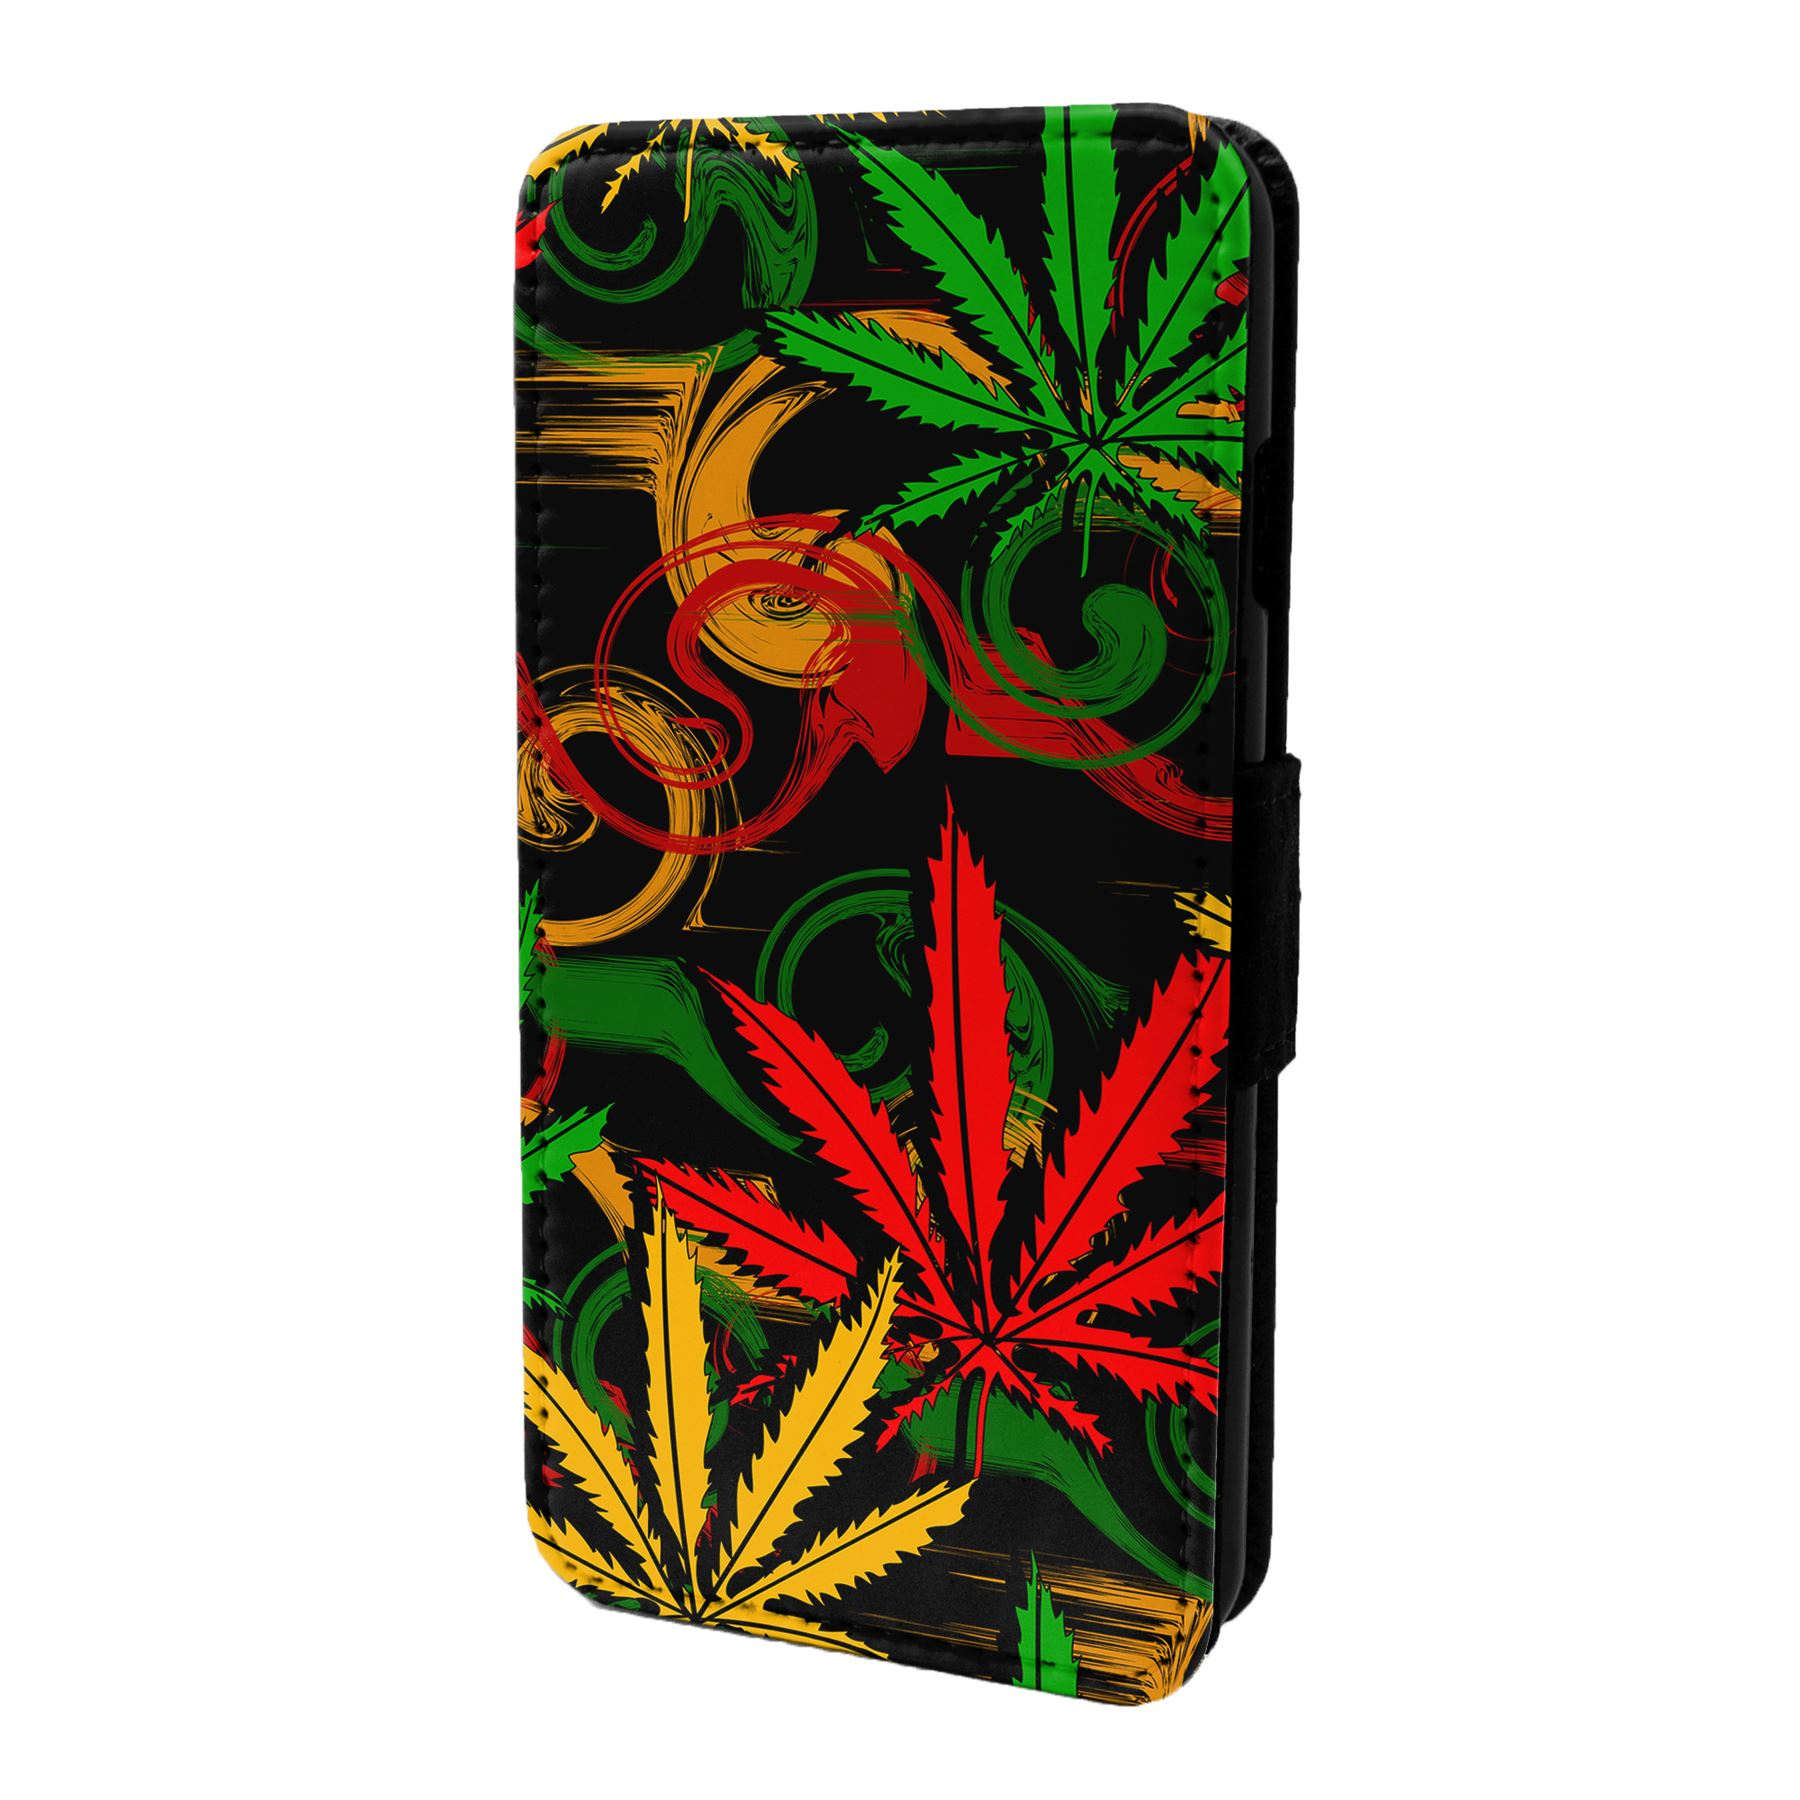 Hoja-Rastafari-Funda-Libro-para-Telefono-Movil-S6827